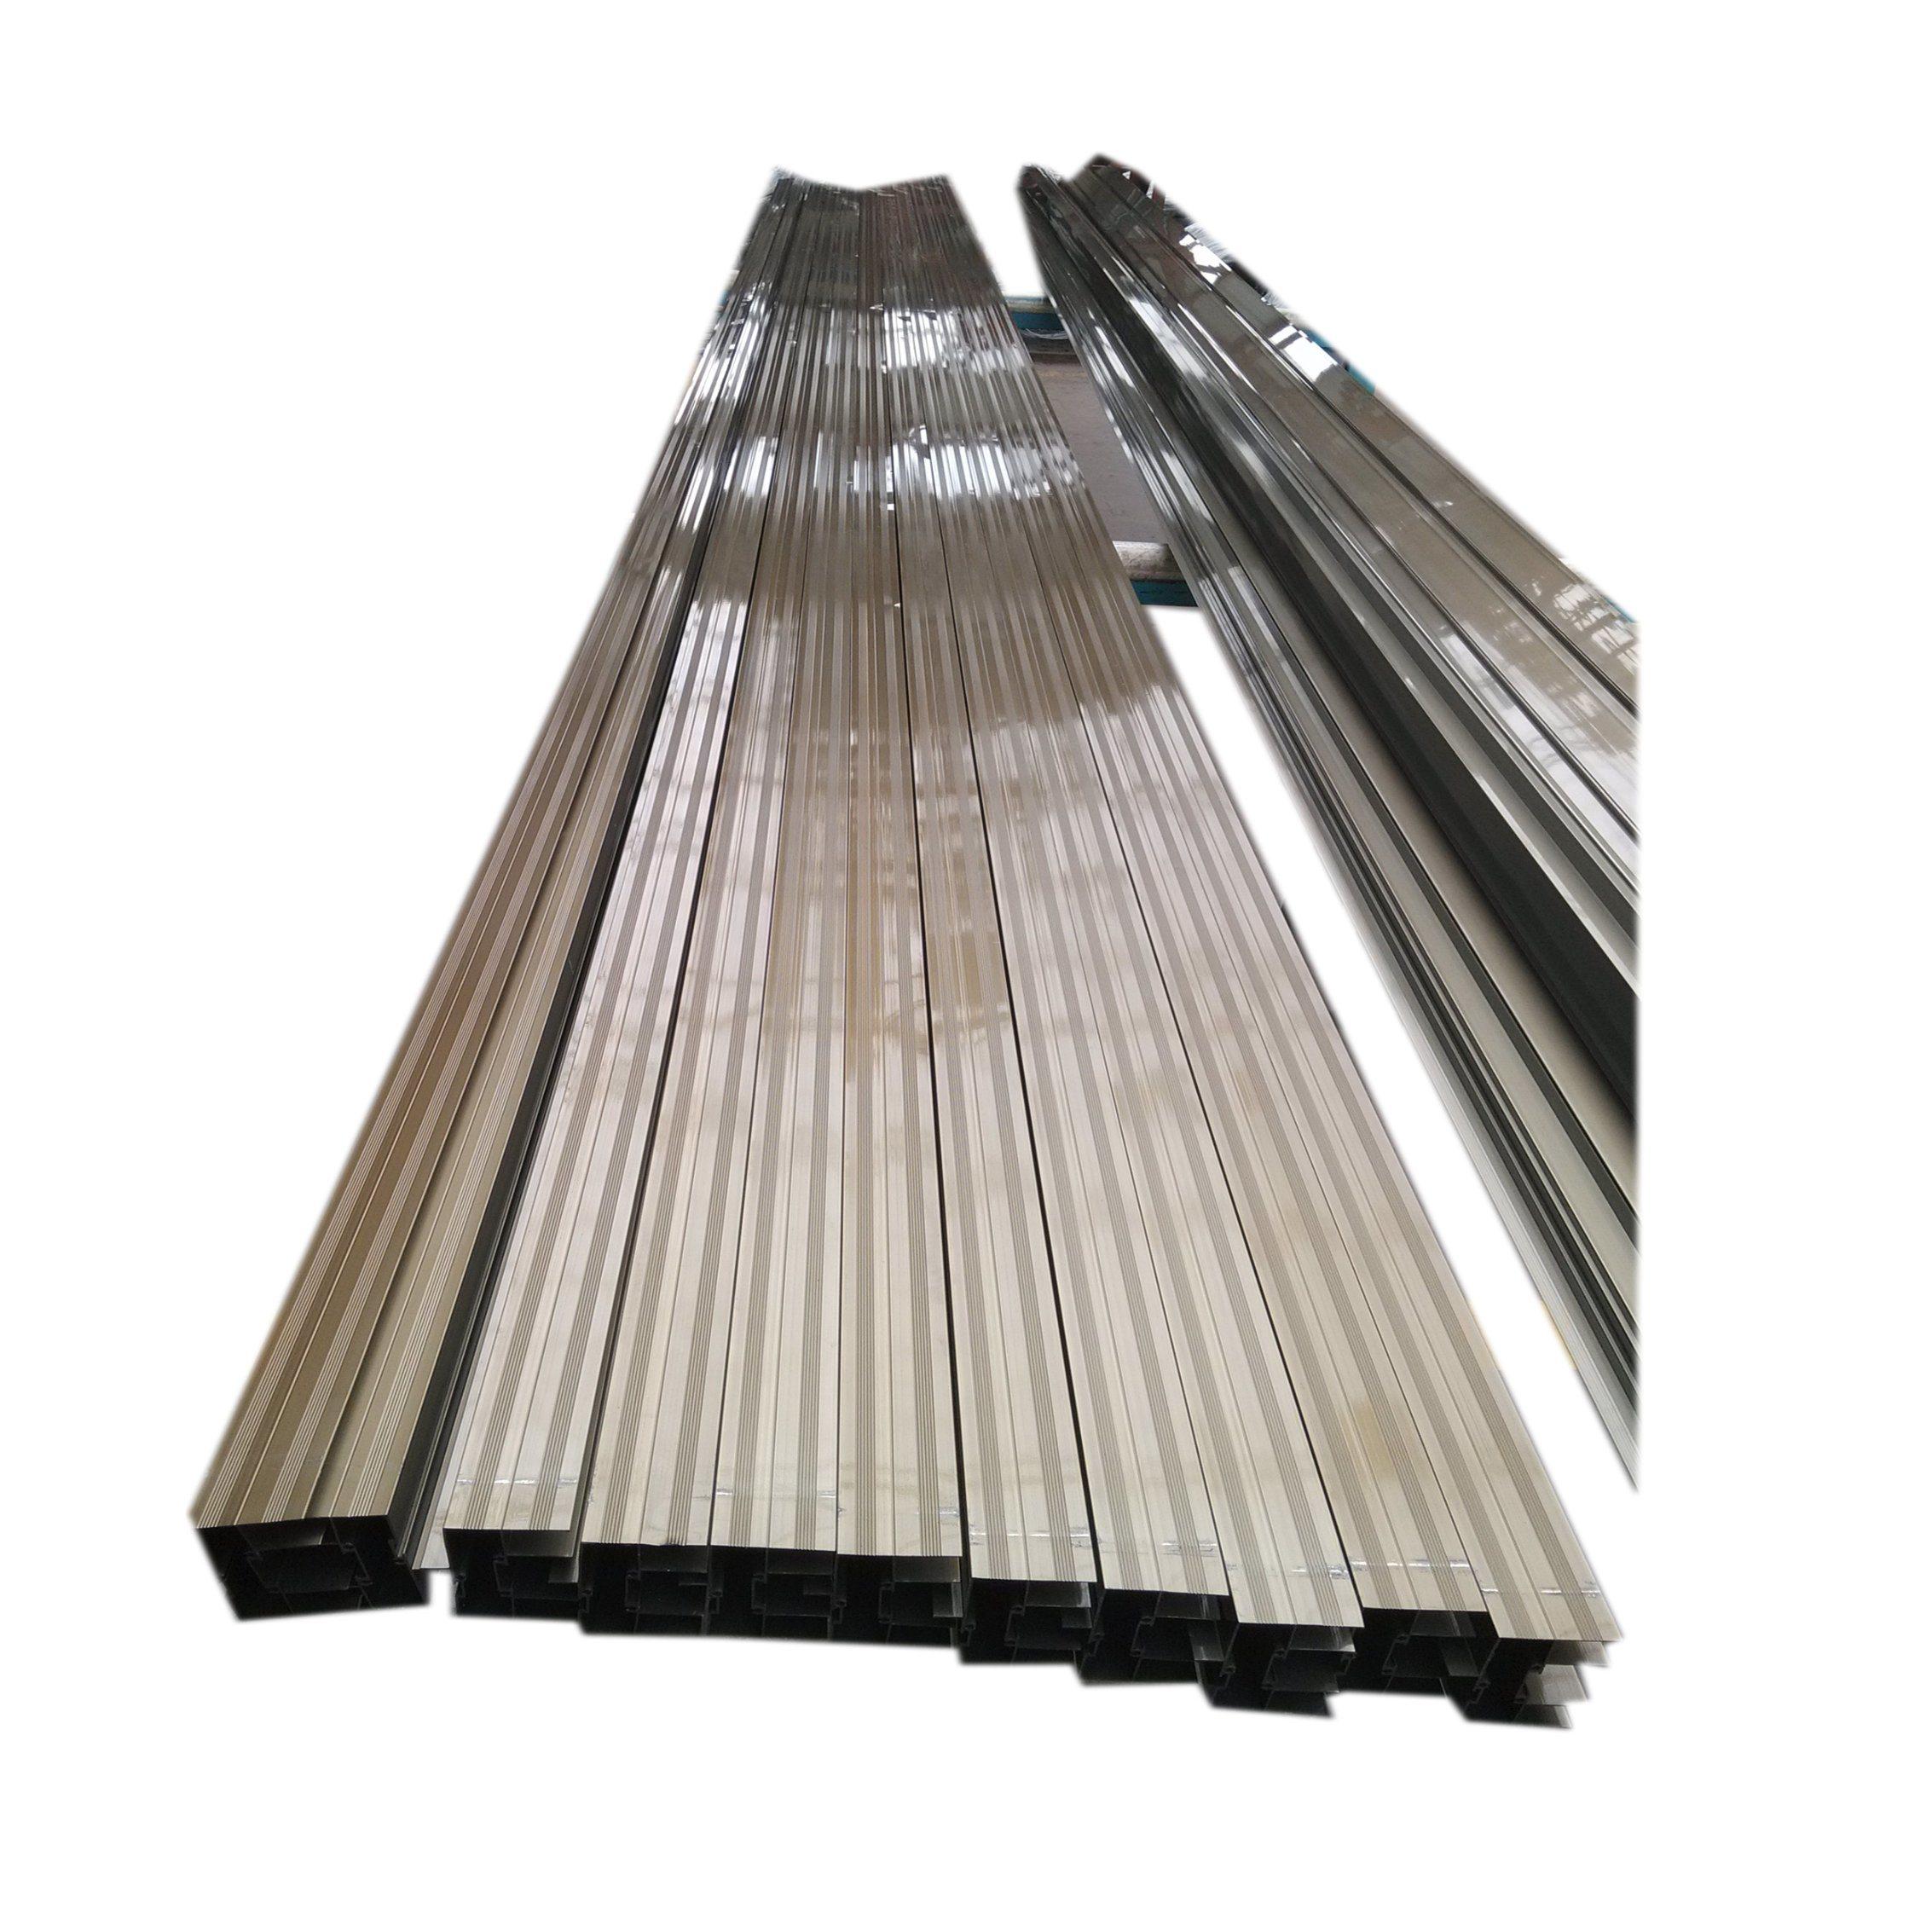 Ecectrophoretic China Sliding Casement Open Aluminium Extrusion Profile for Window Door Industrial